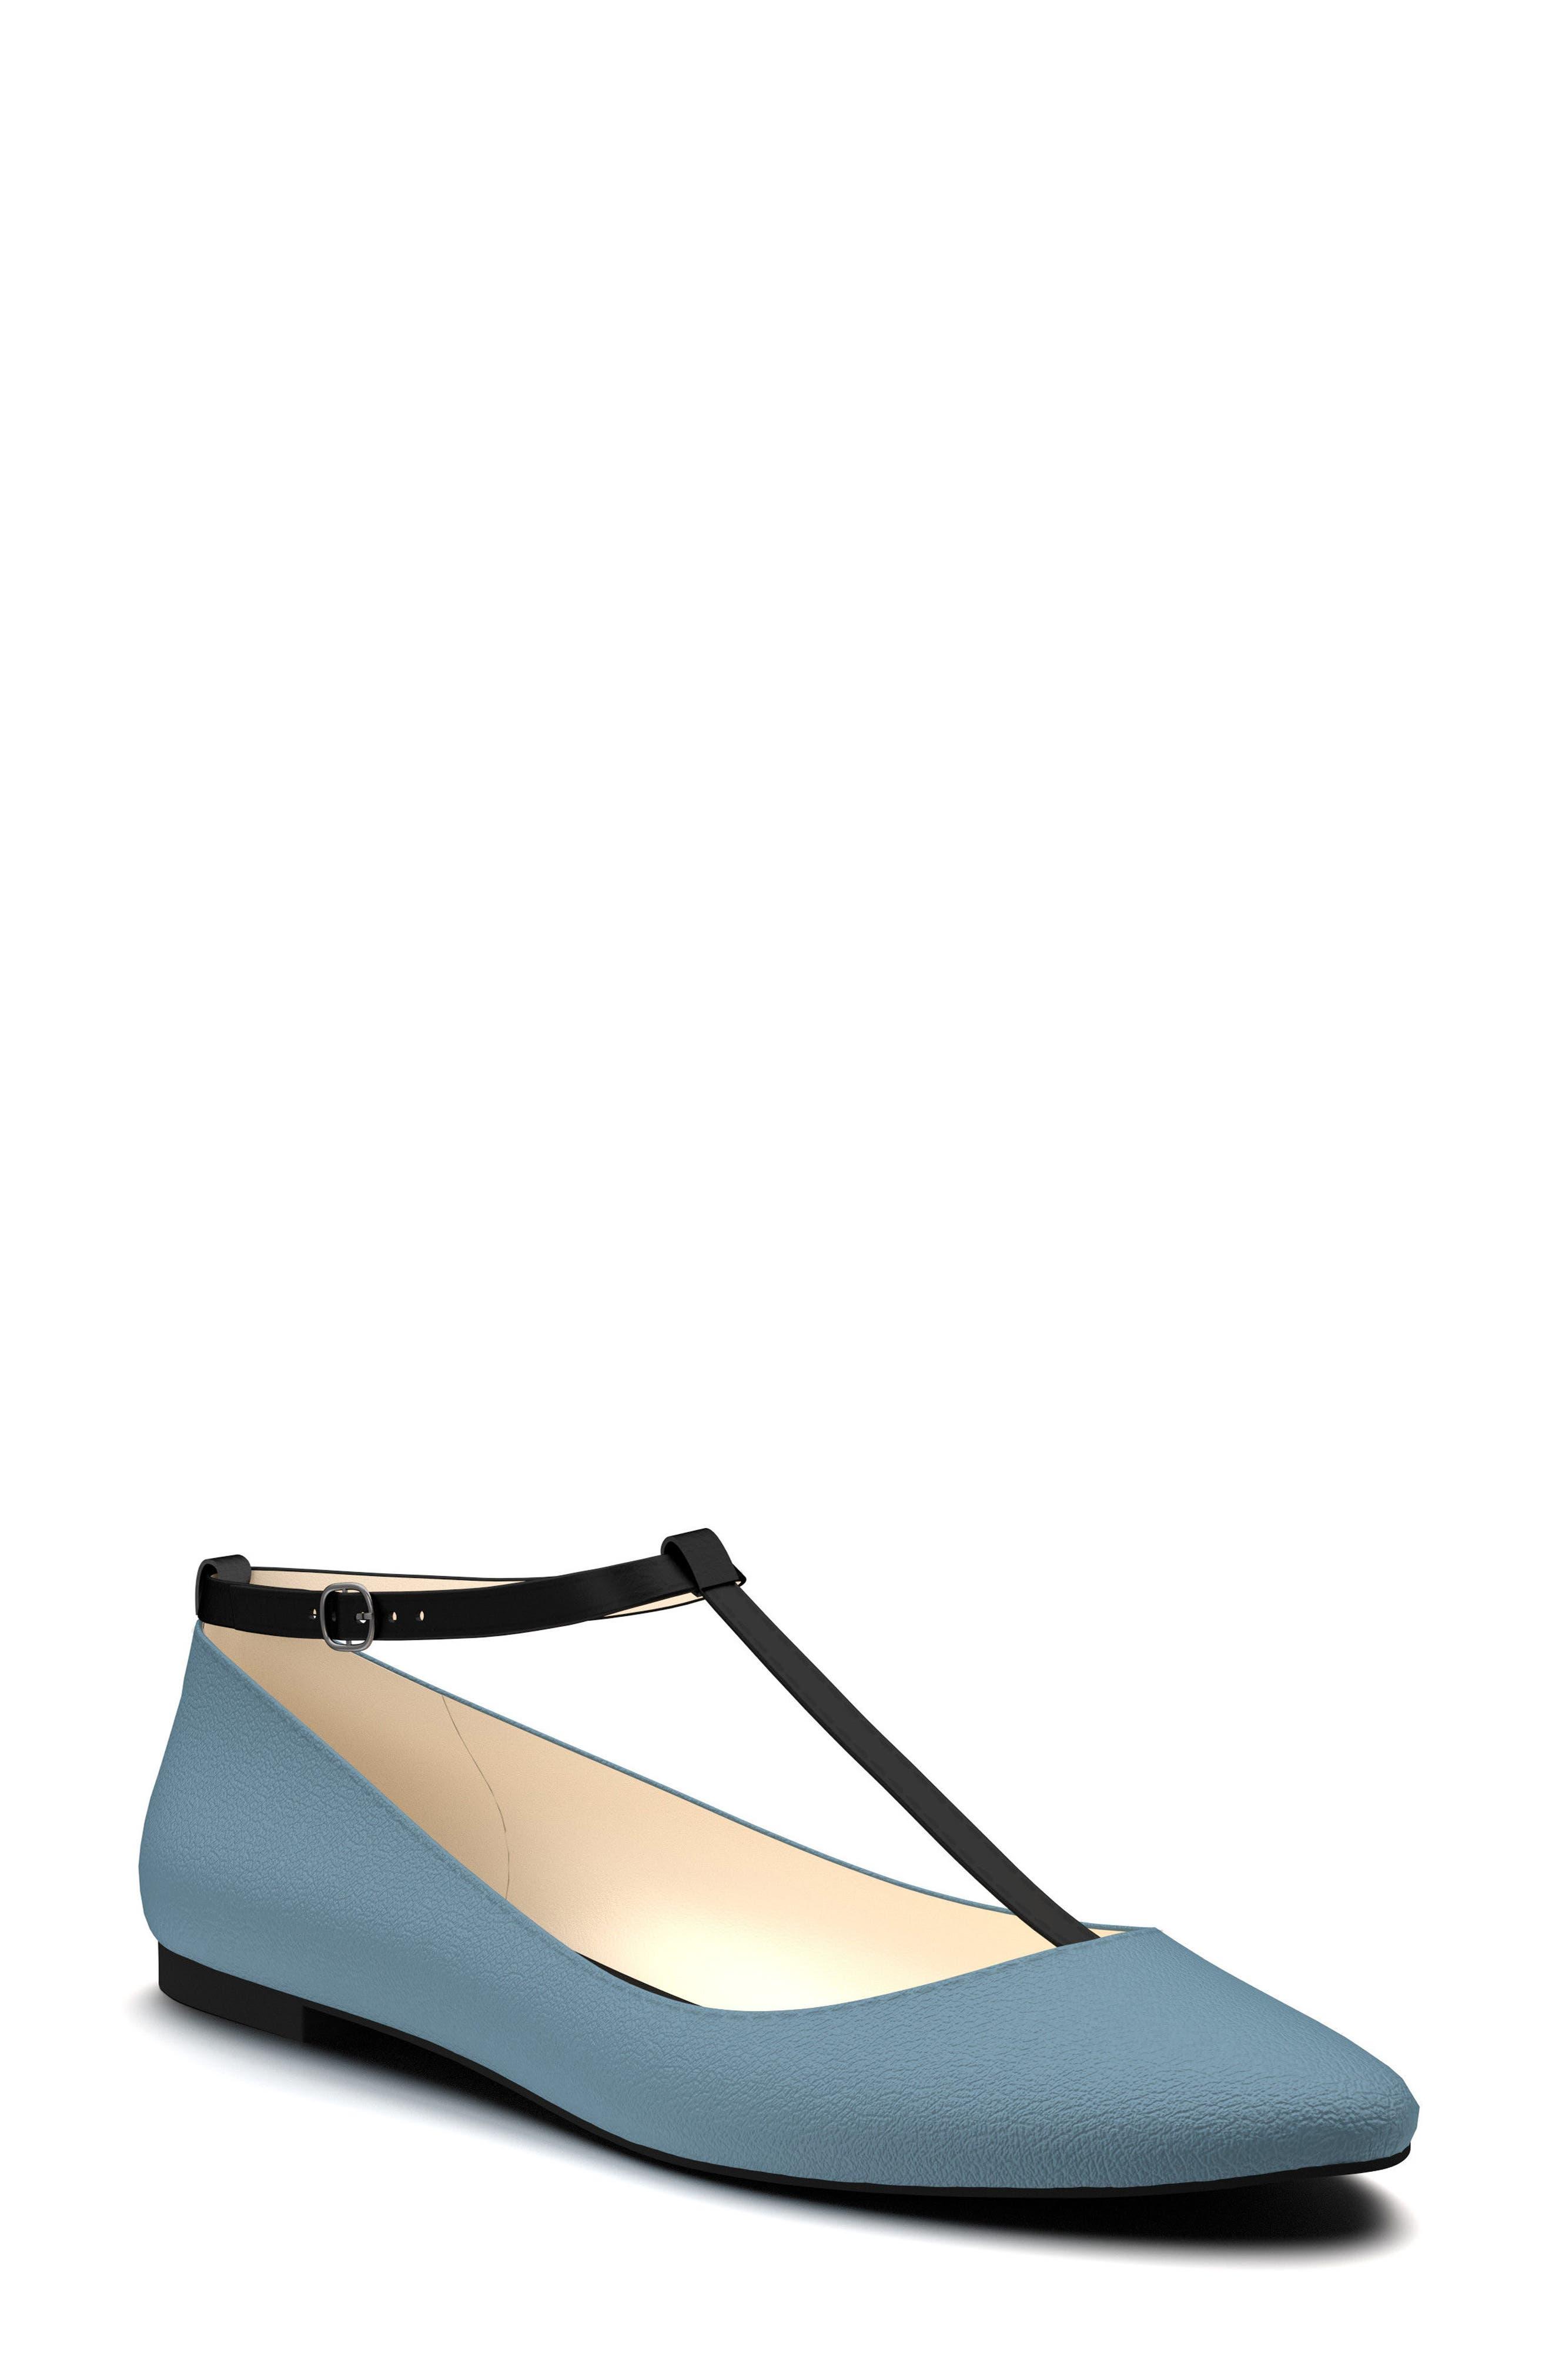 Main Image - Shoes of Prey T-Strap Ballet Flat (Women)